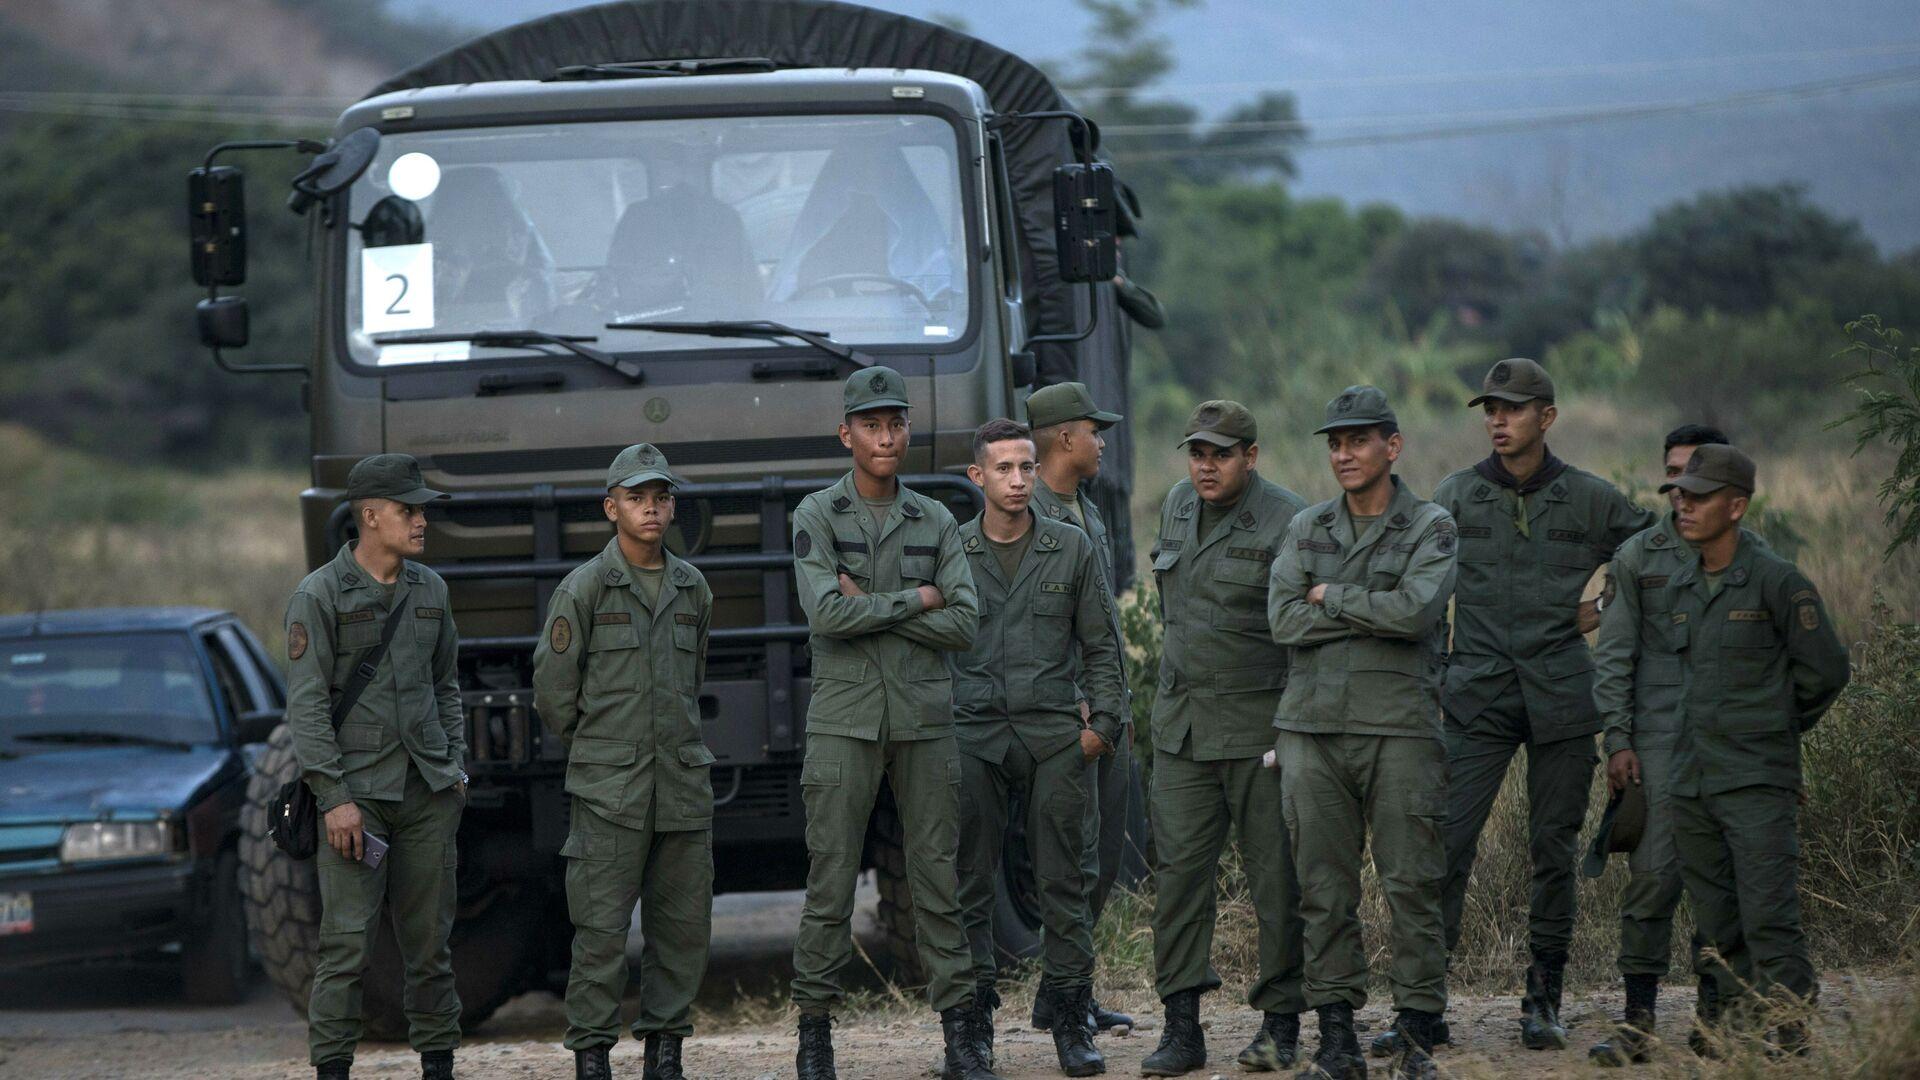 Militares venezolanos en la frontera con Colombia - Sputnik Mundo, 1920, 02.03.2020